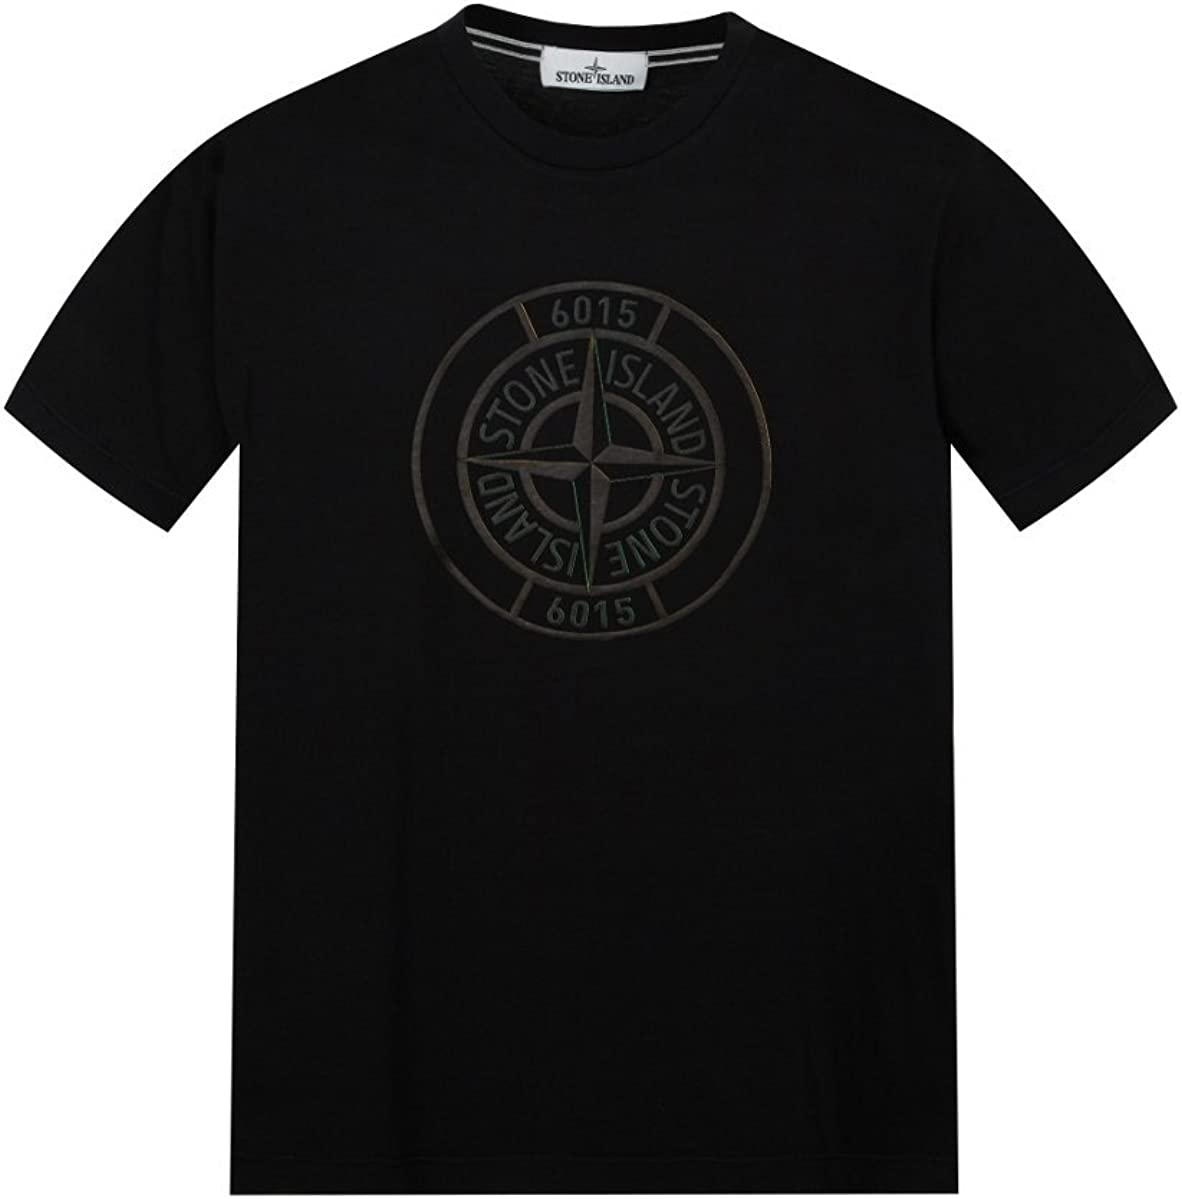 Stone Island Junior Large Compass Logo T-Shirt Black